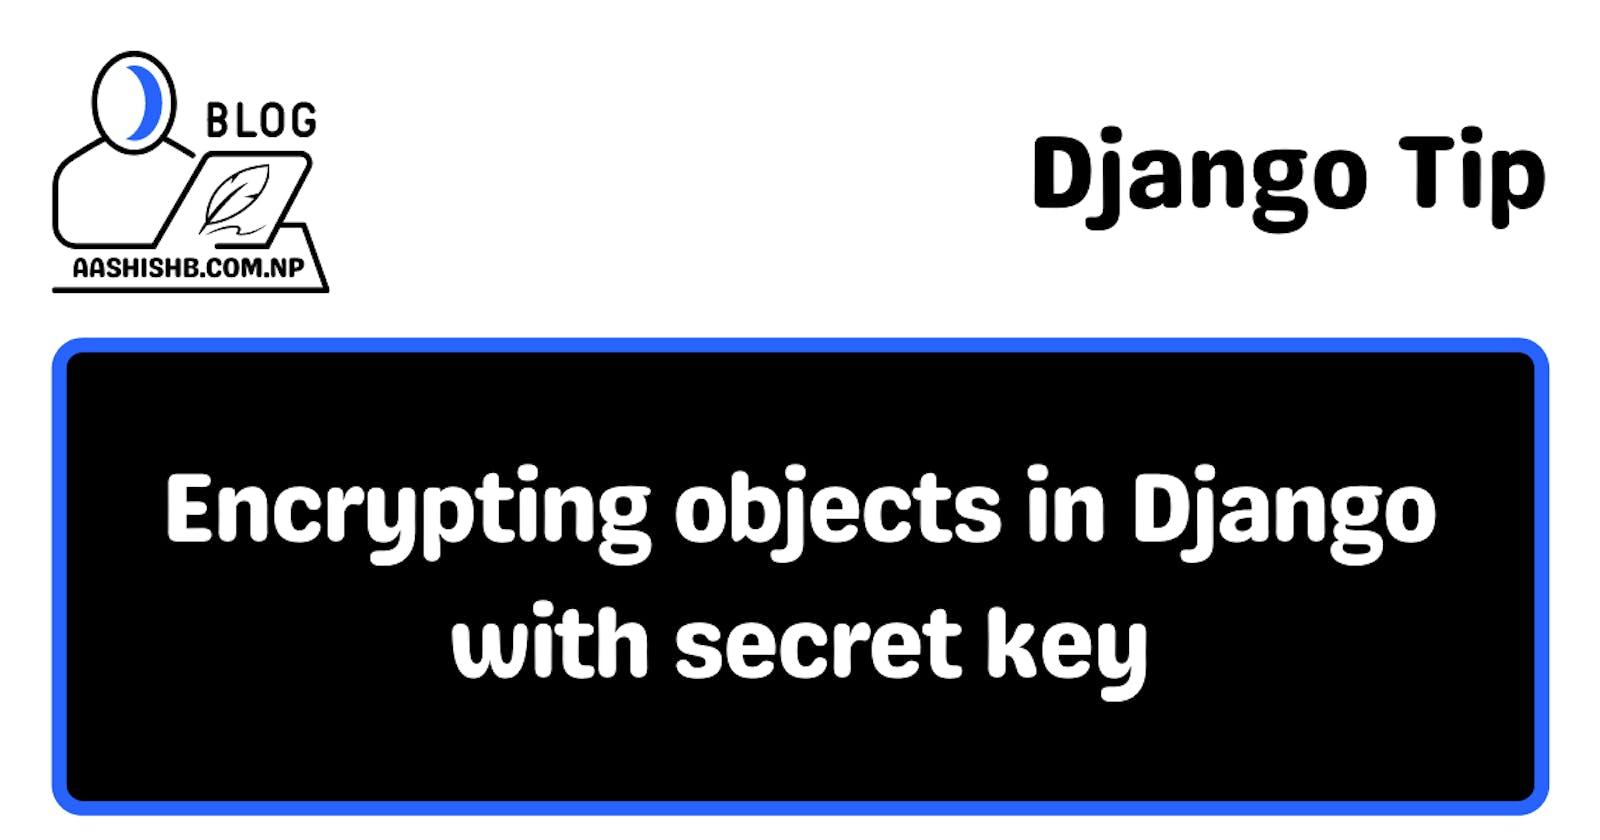 Django Tip | Encrypting objects in Django with secret key.